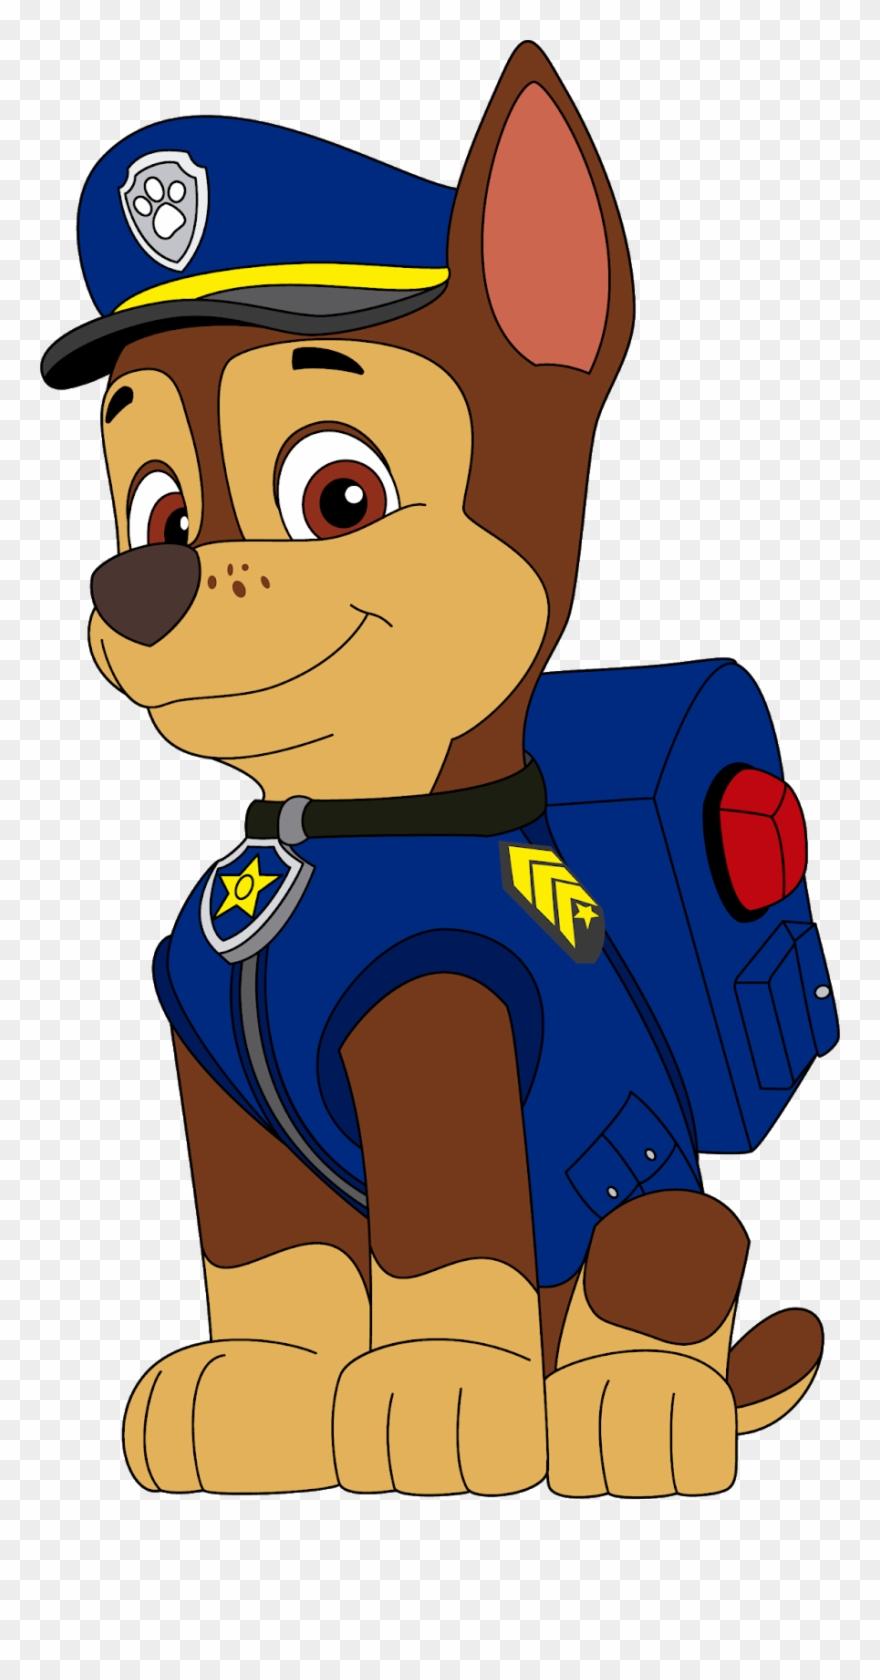 hight resolution of patrulha canina vetor gr tis paw patrol free vector clipart